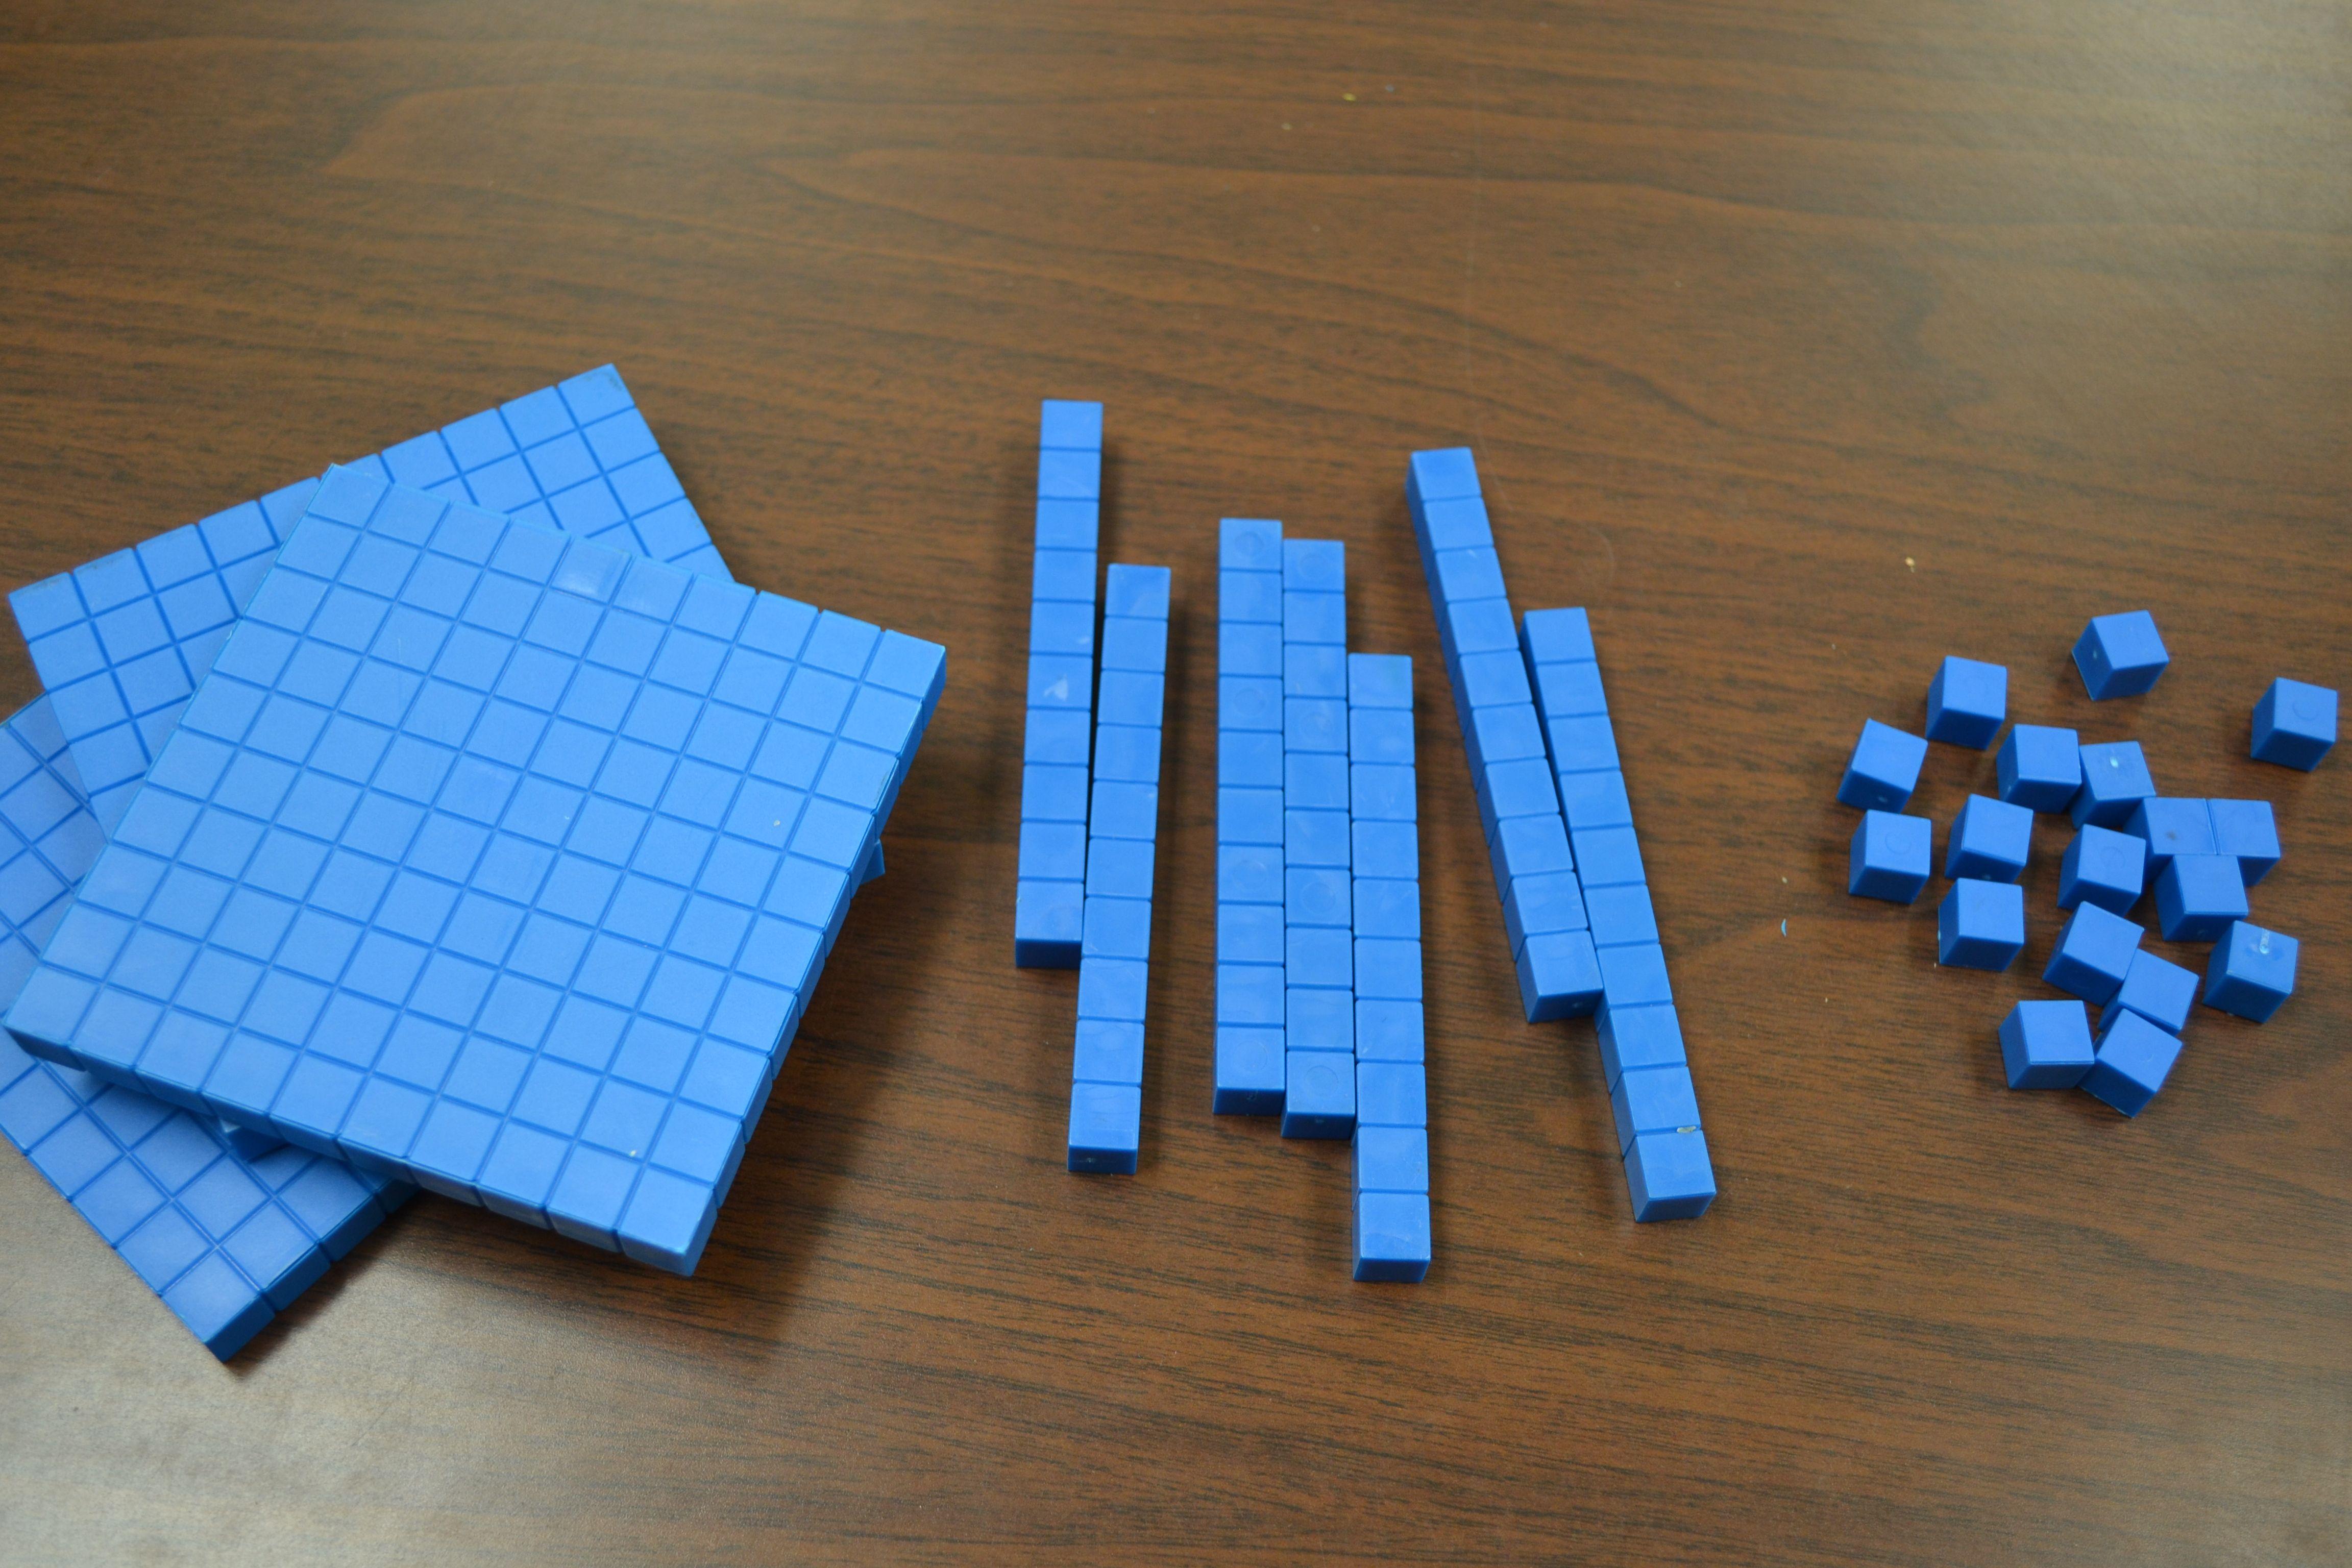 Base 10 Blocks Explain Decimals Omg I Remember Using